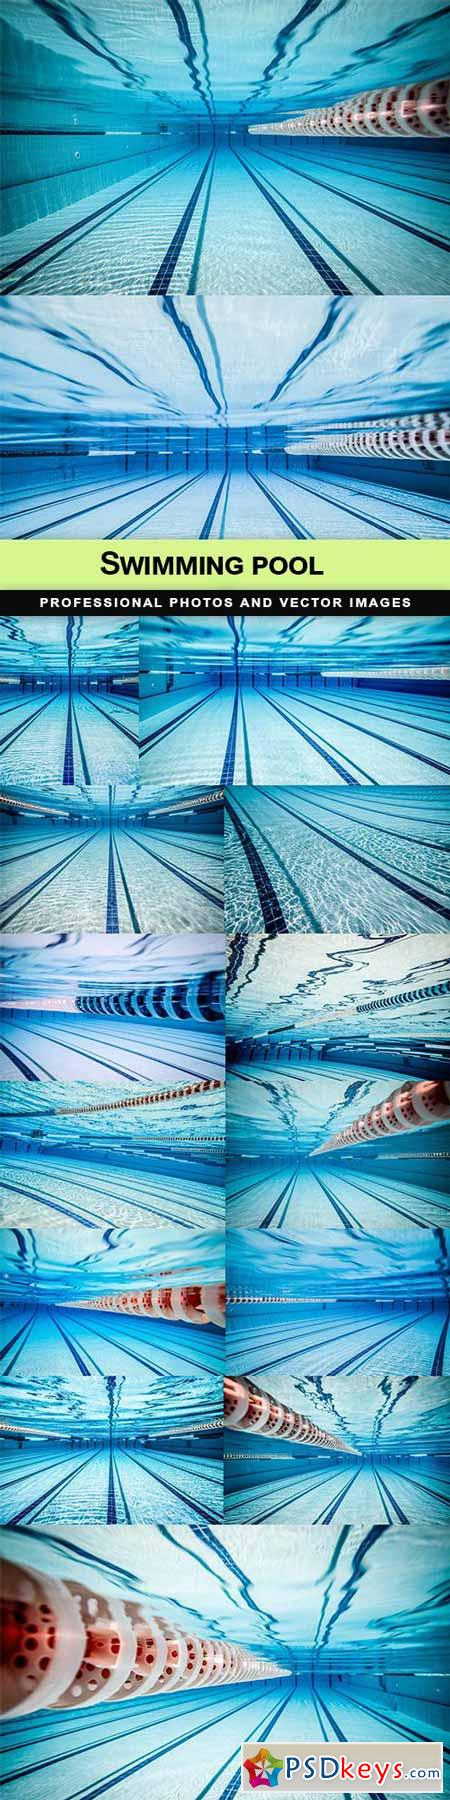 Swimming pool - 15 UHQ JPEG